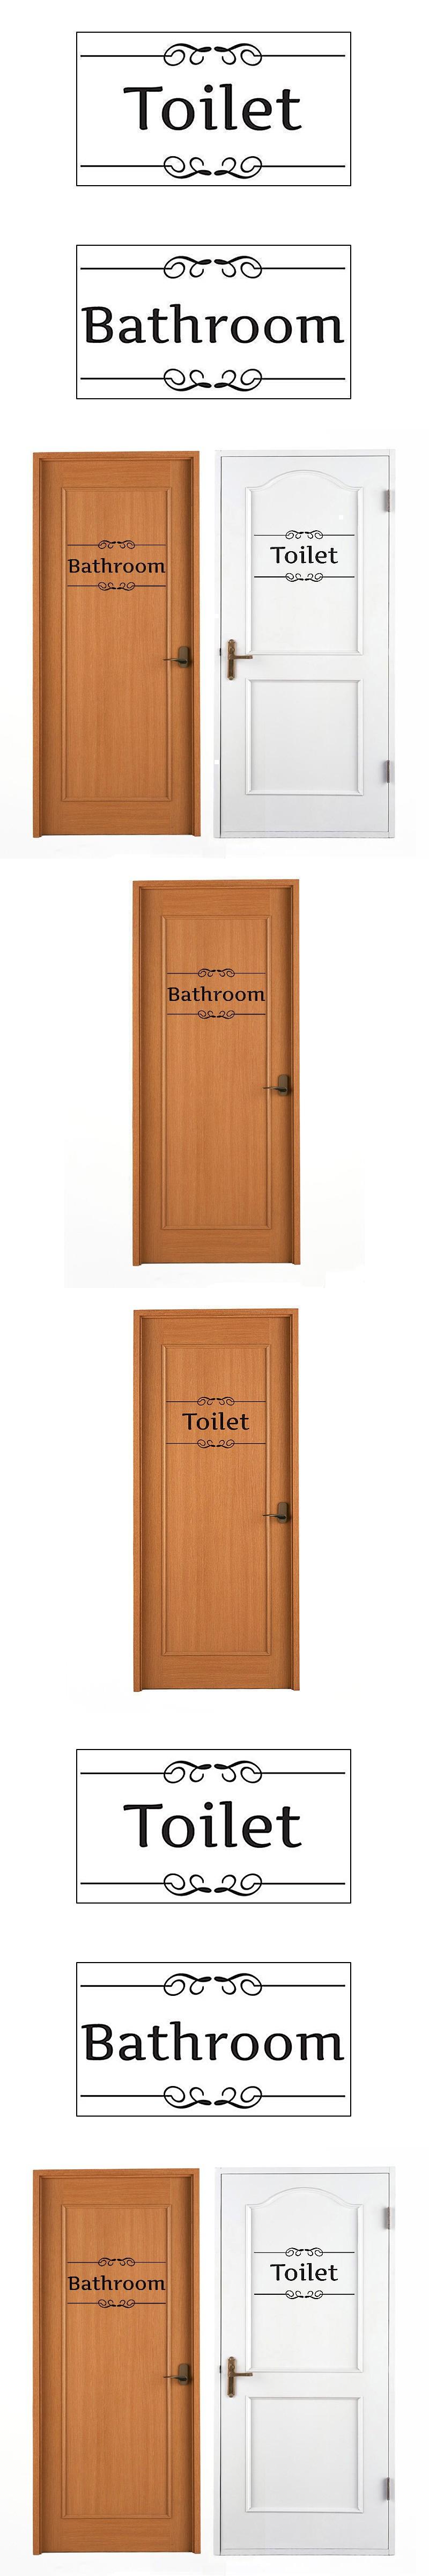 Pcs black bathroom toilet door sign wall stickers decal art diy